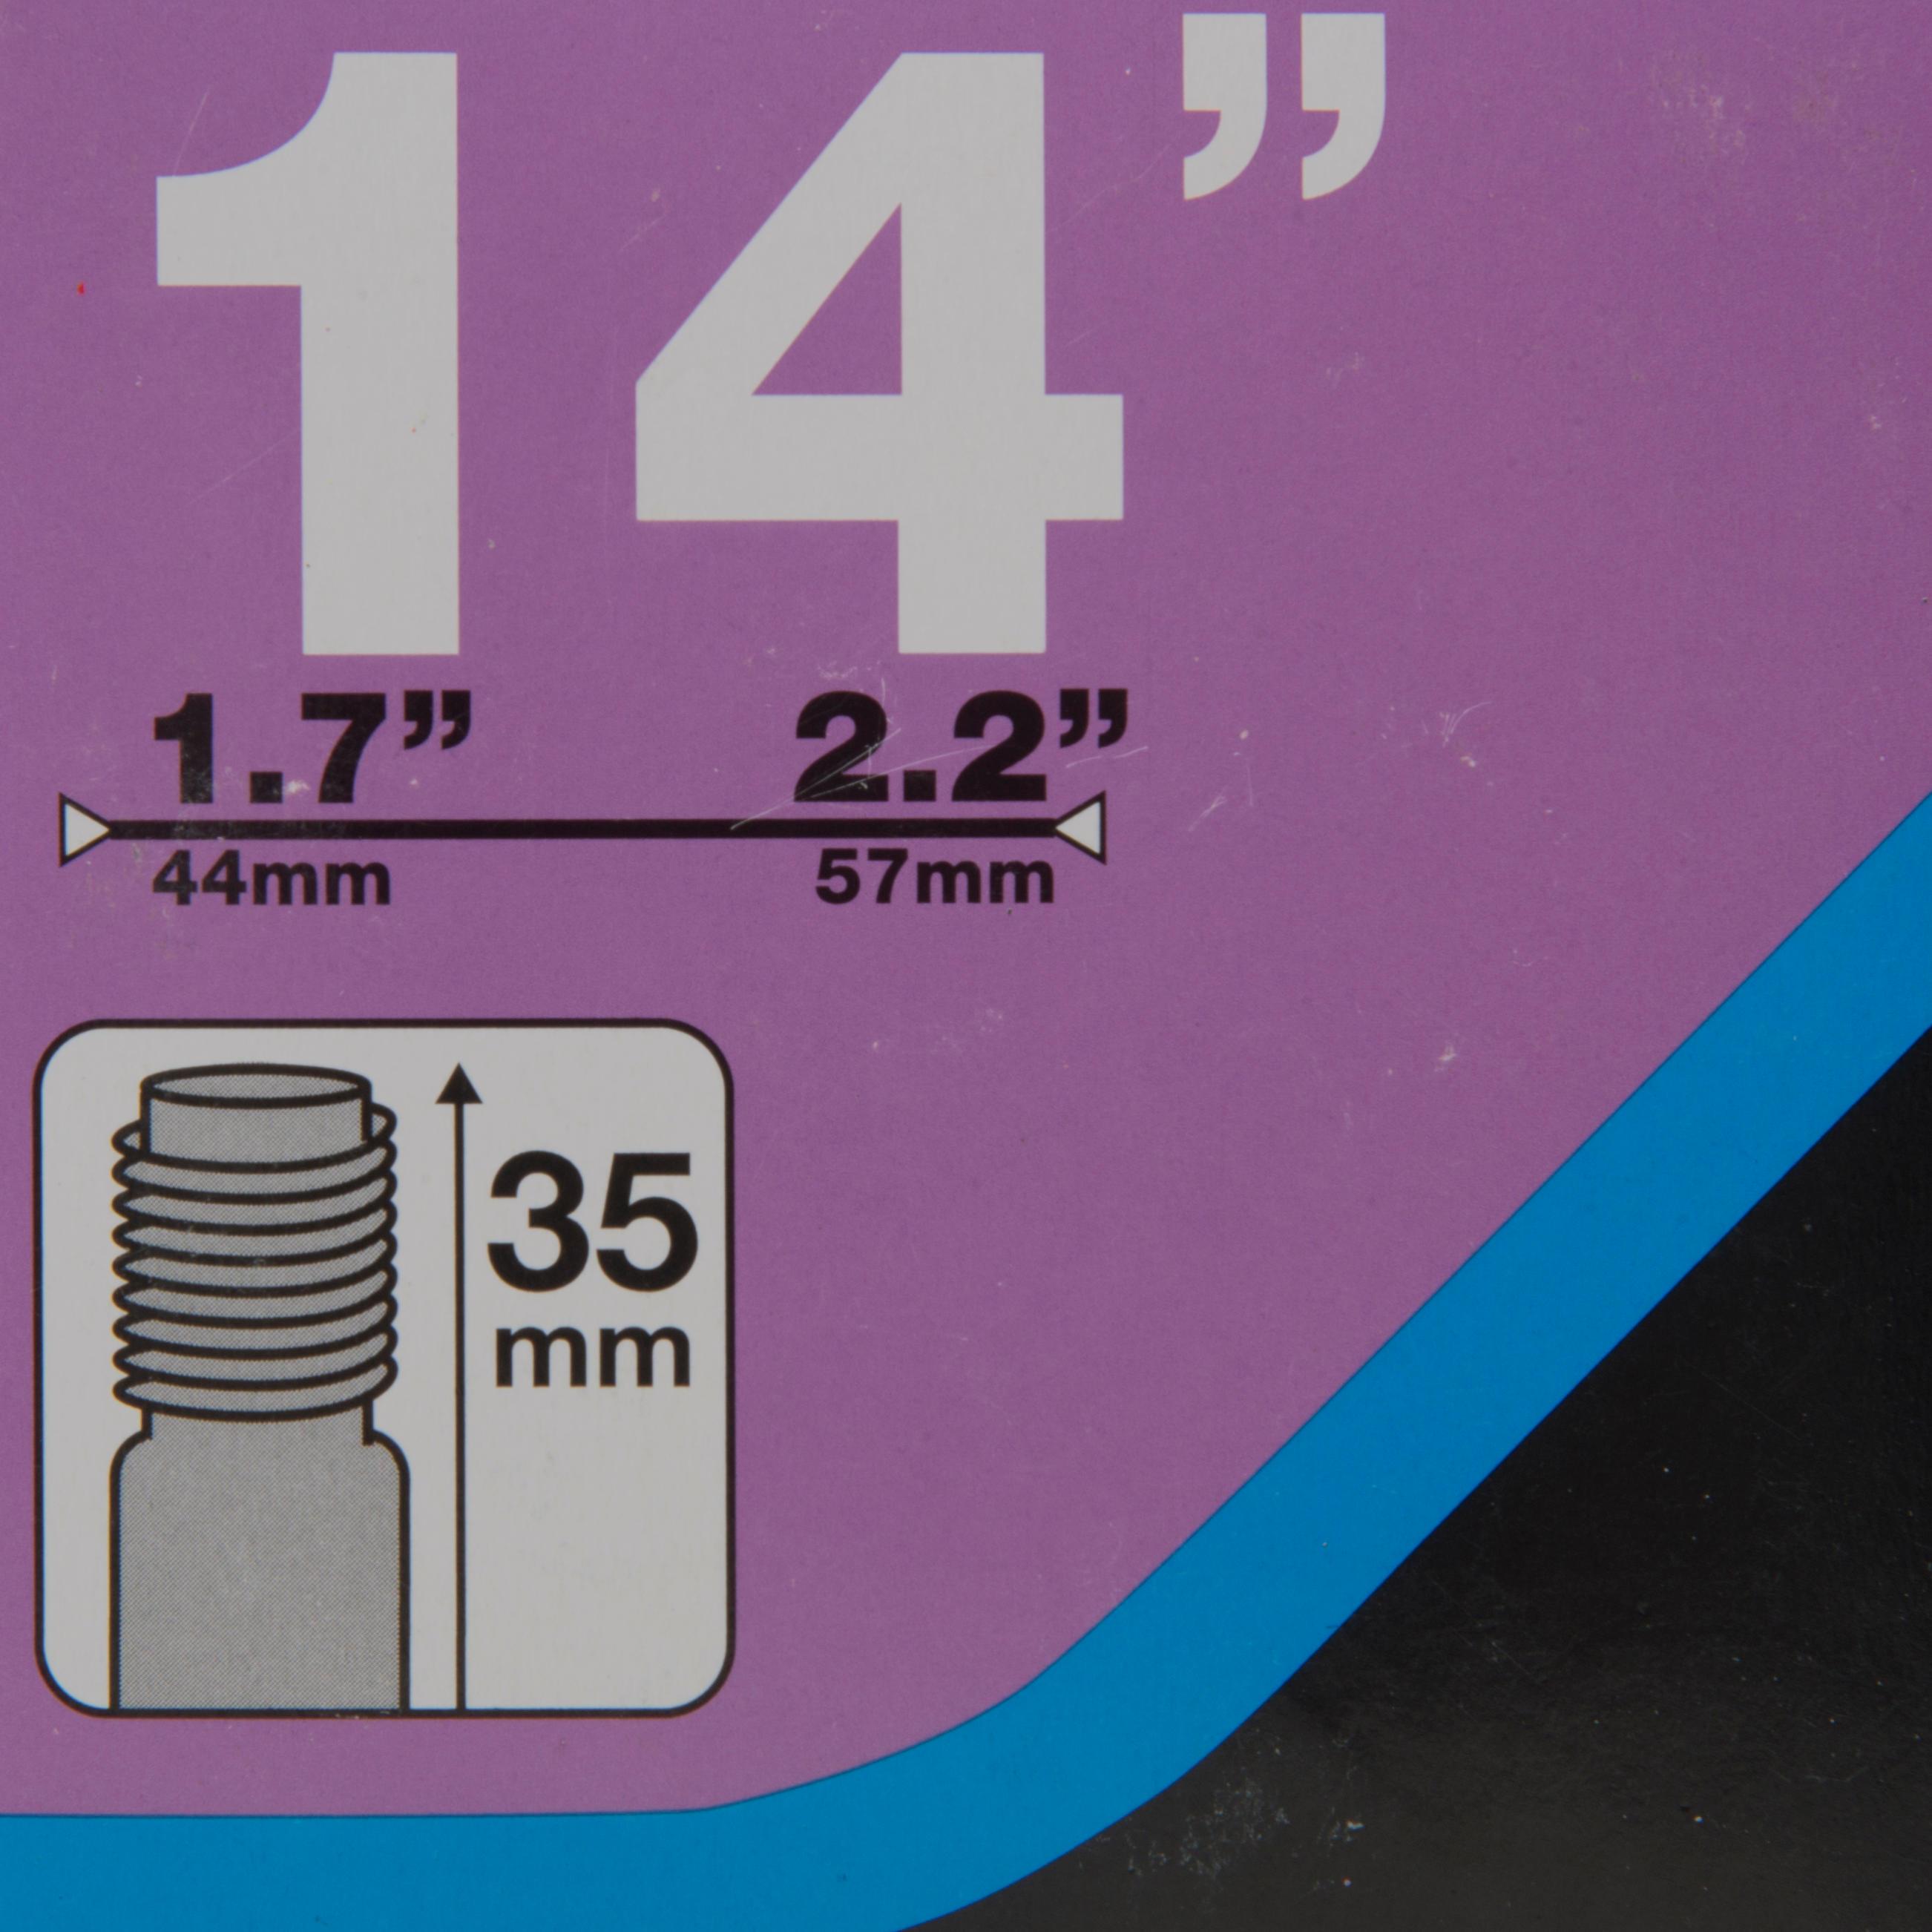 14_QUOTE_ 1.7 to 2.2 Schrader Valve Inner Tube